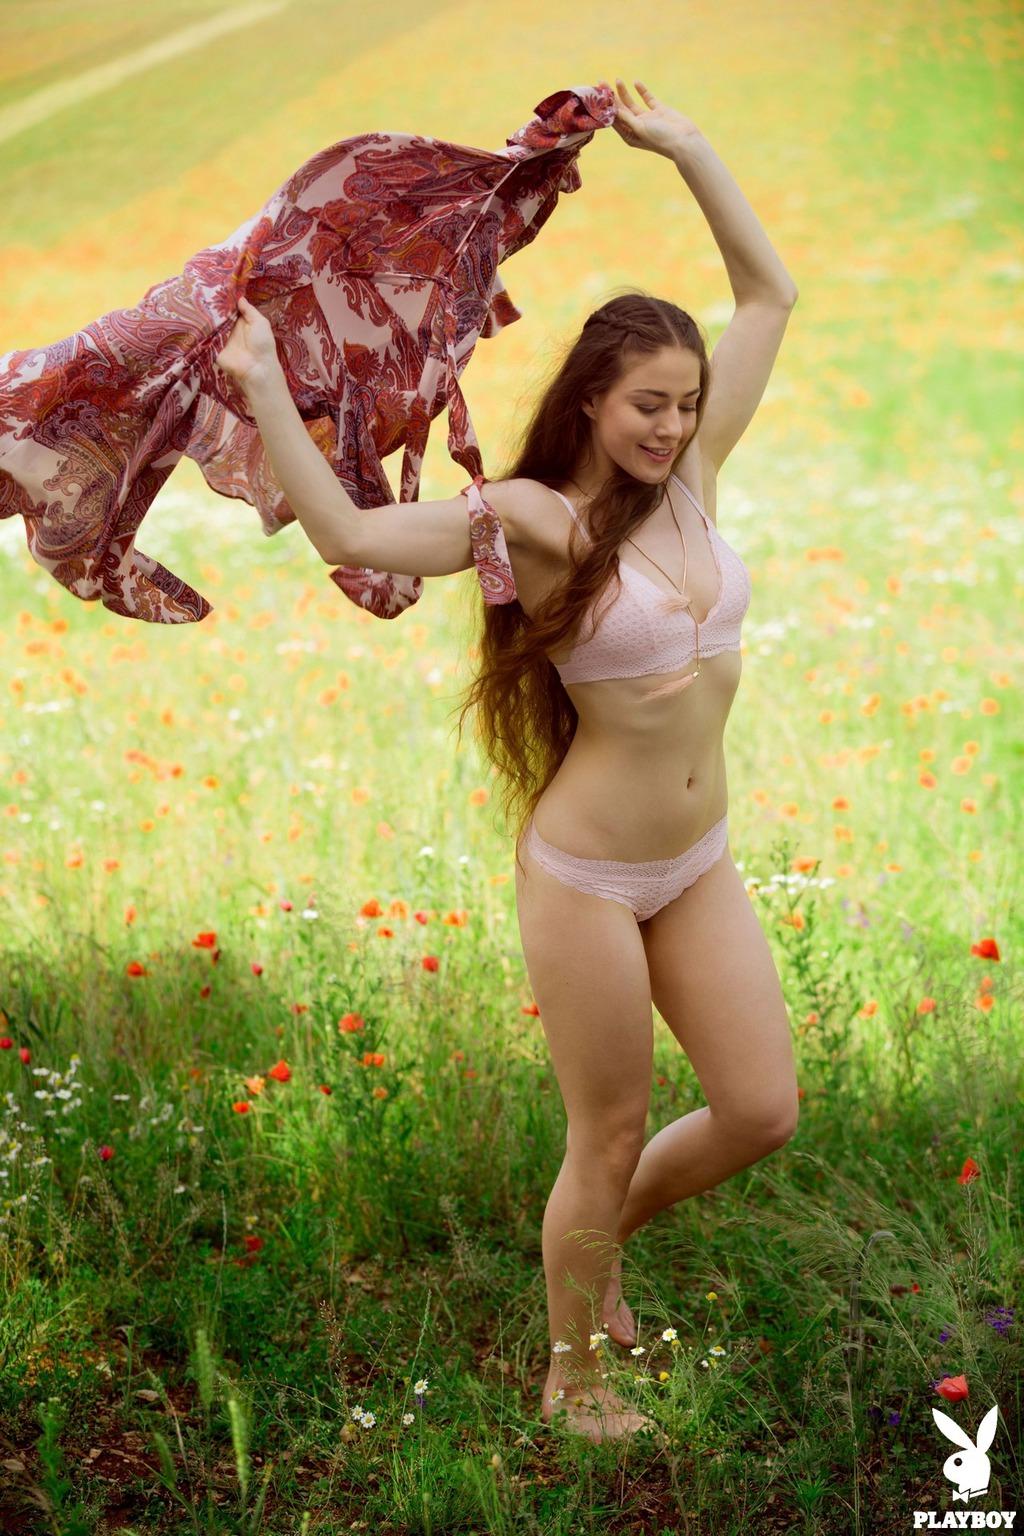 PHOTO | 00 23 - Hairy Joy Draiki Posing In The Field